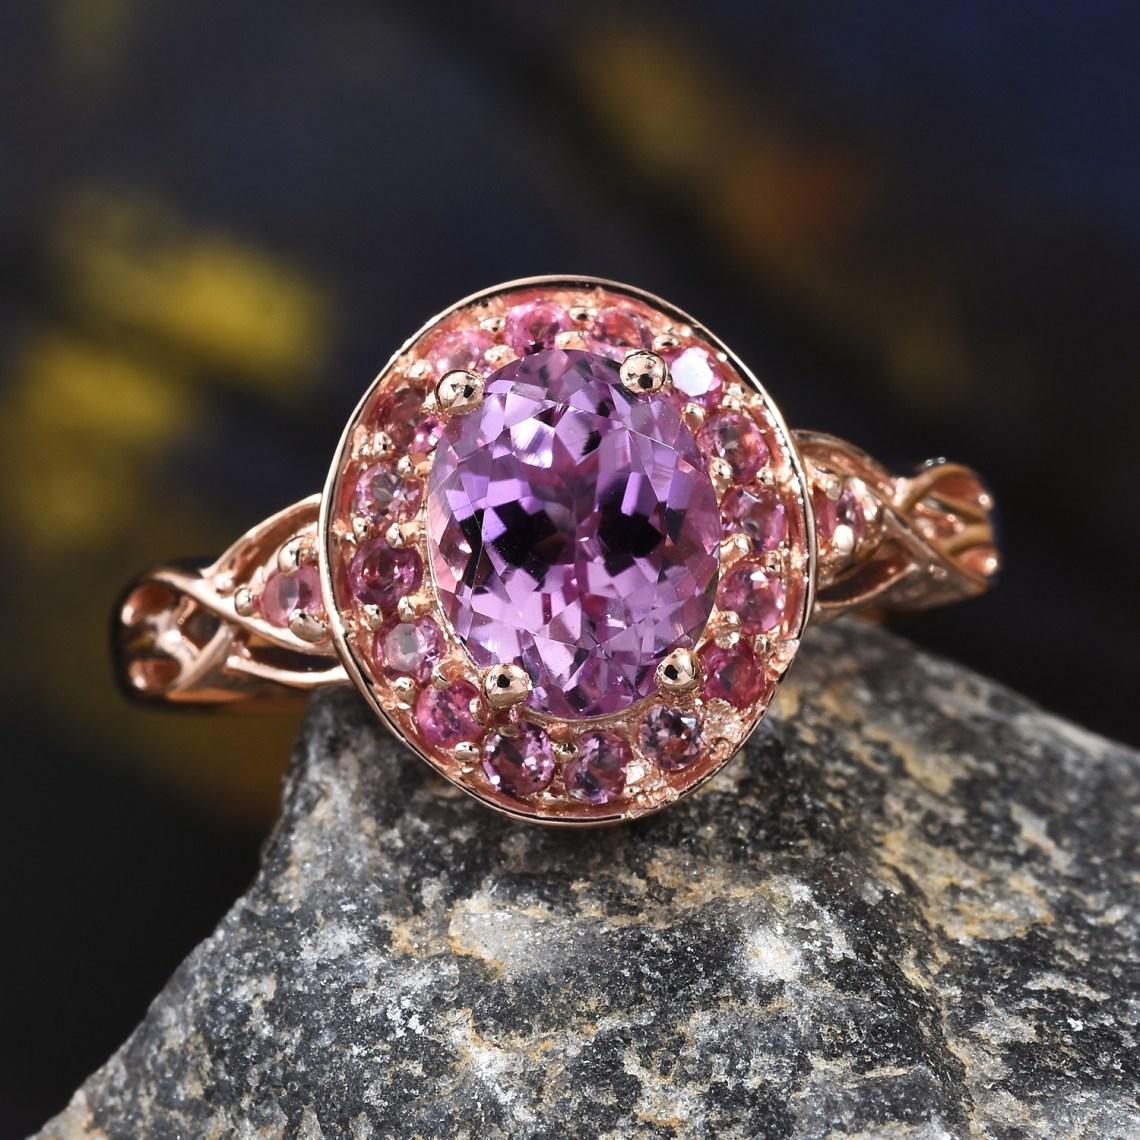 Kunzite ring in gold resting on stone.